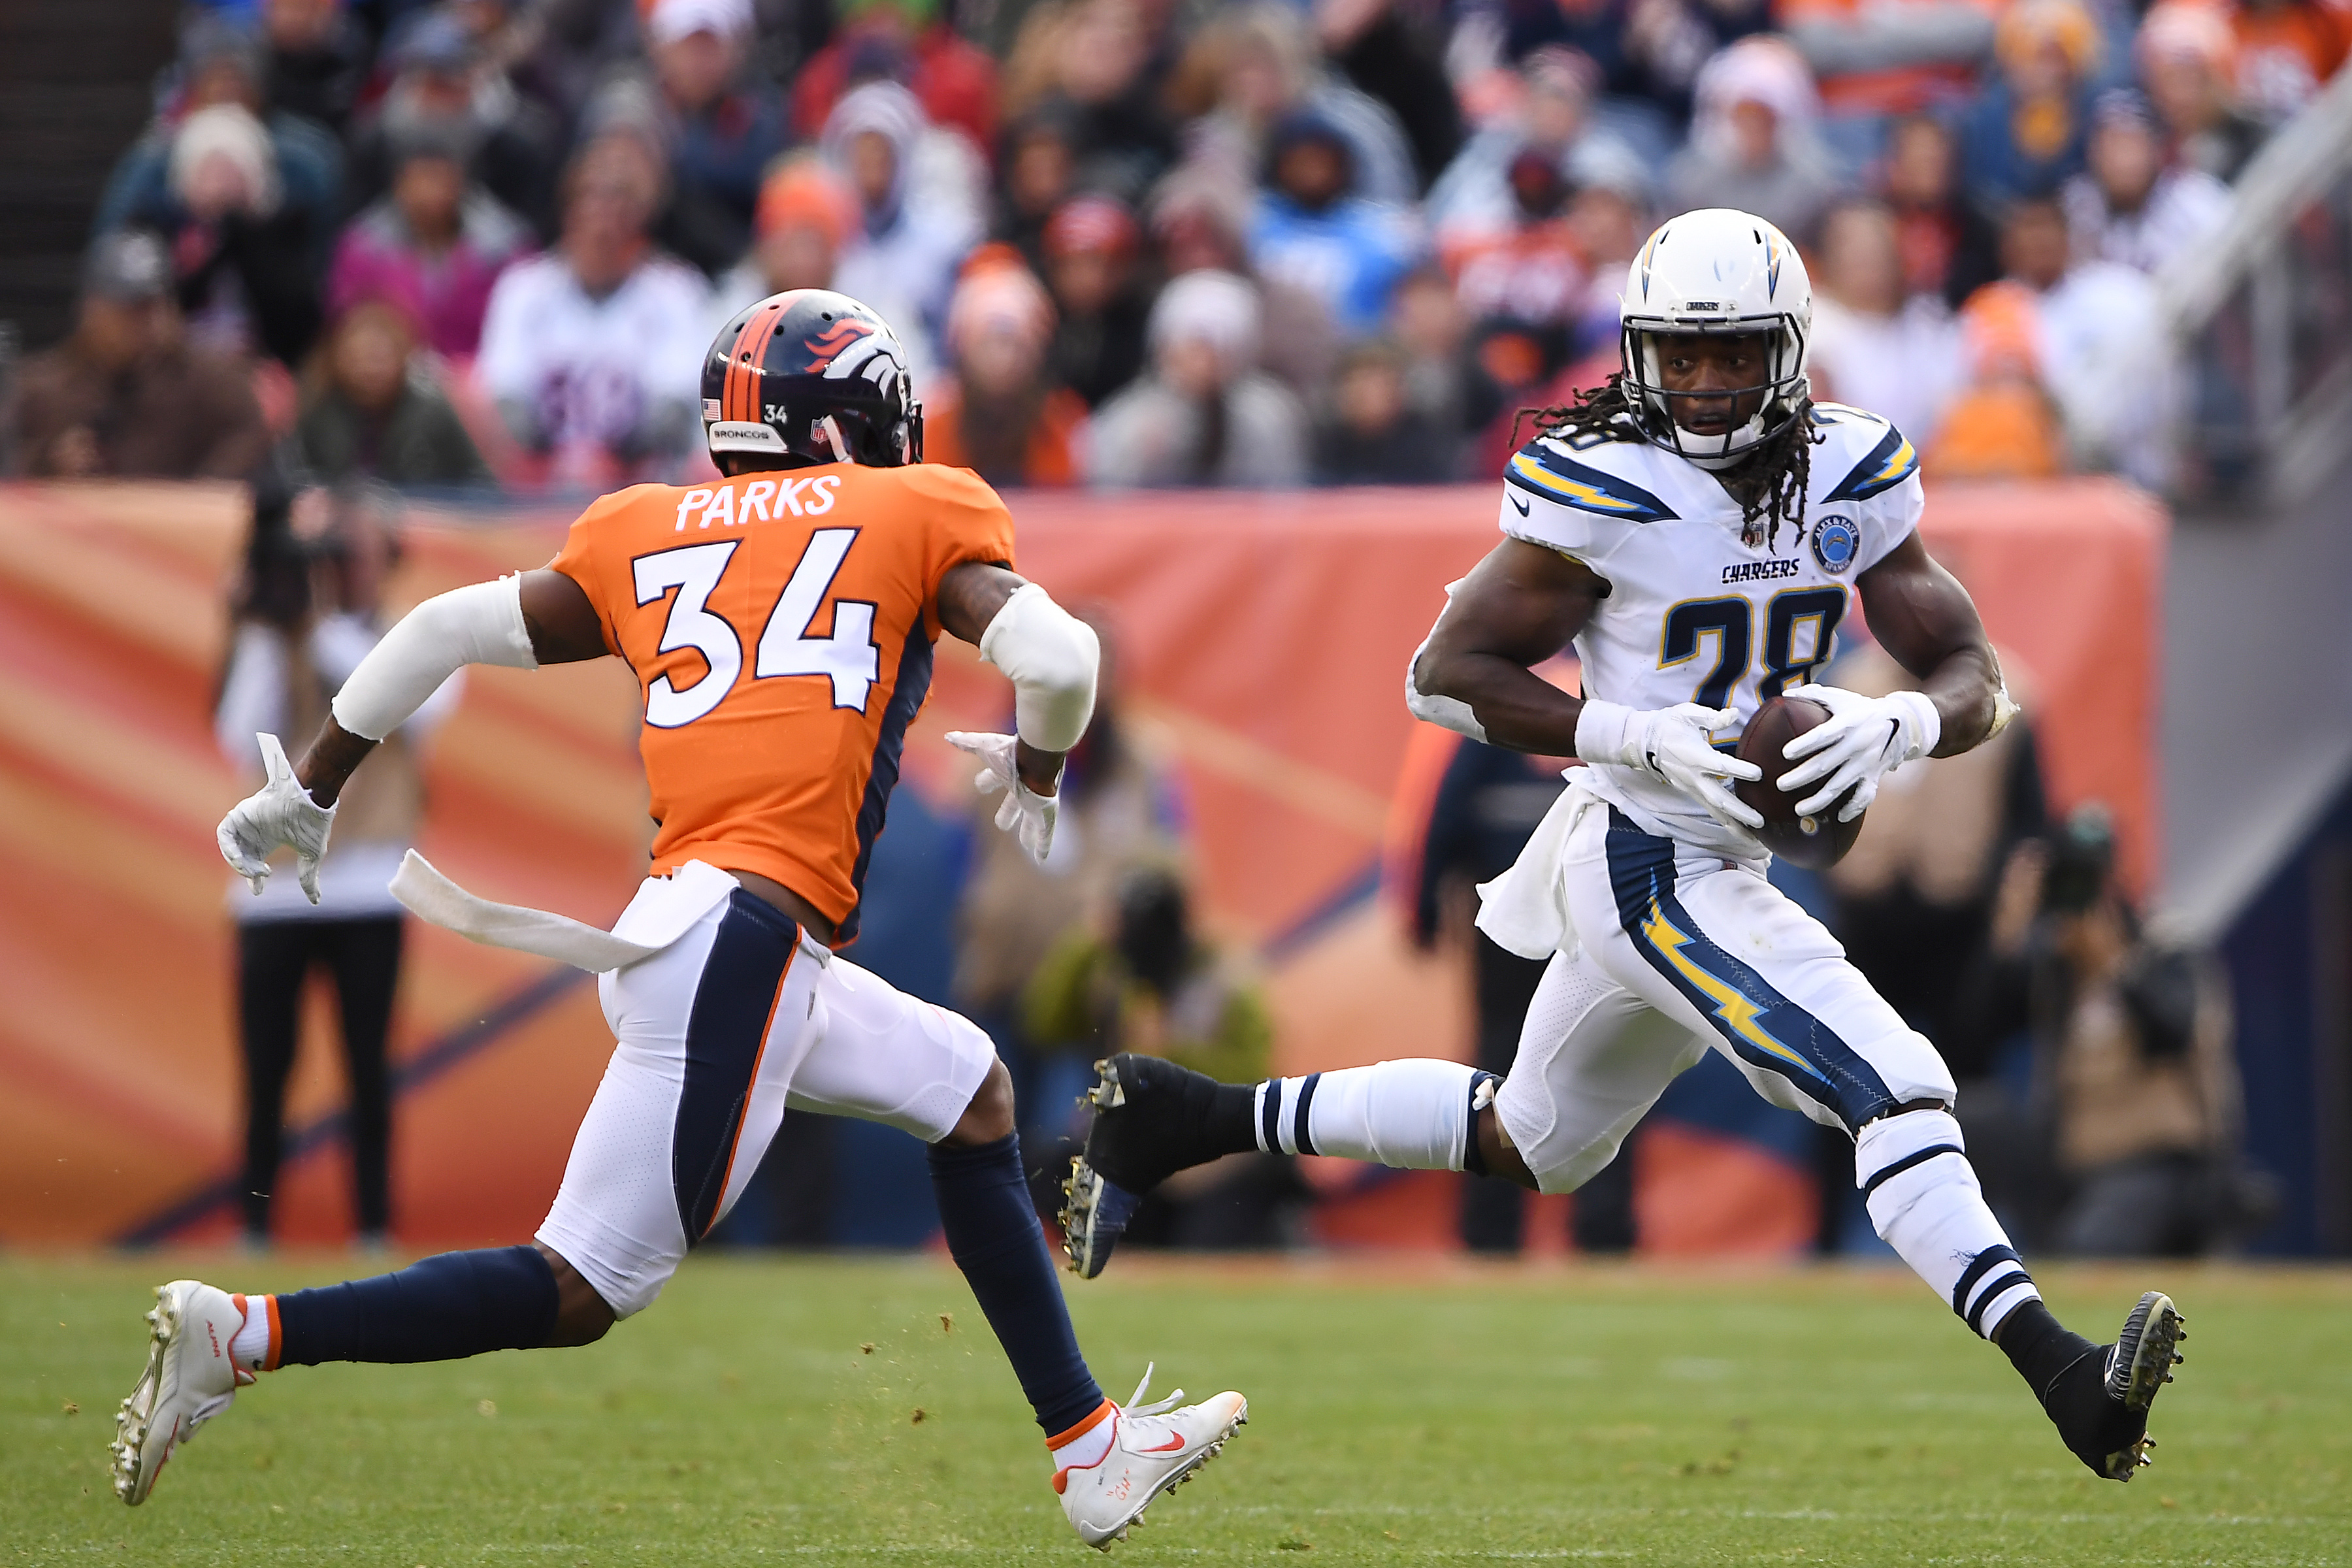 Denver Broncos vs. Los Angeles Chargers, NFL Week 16